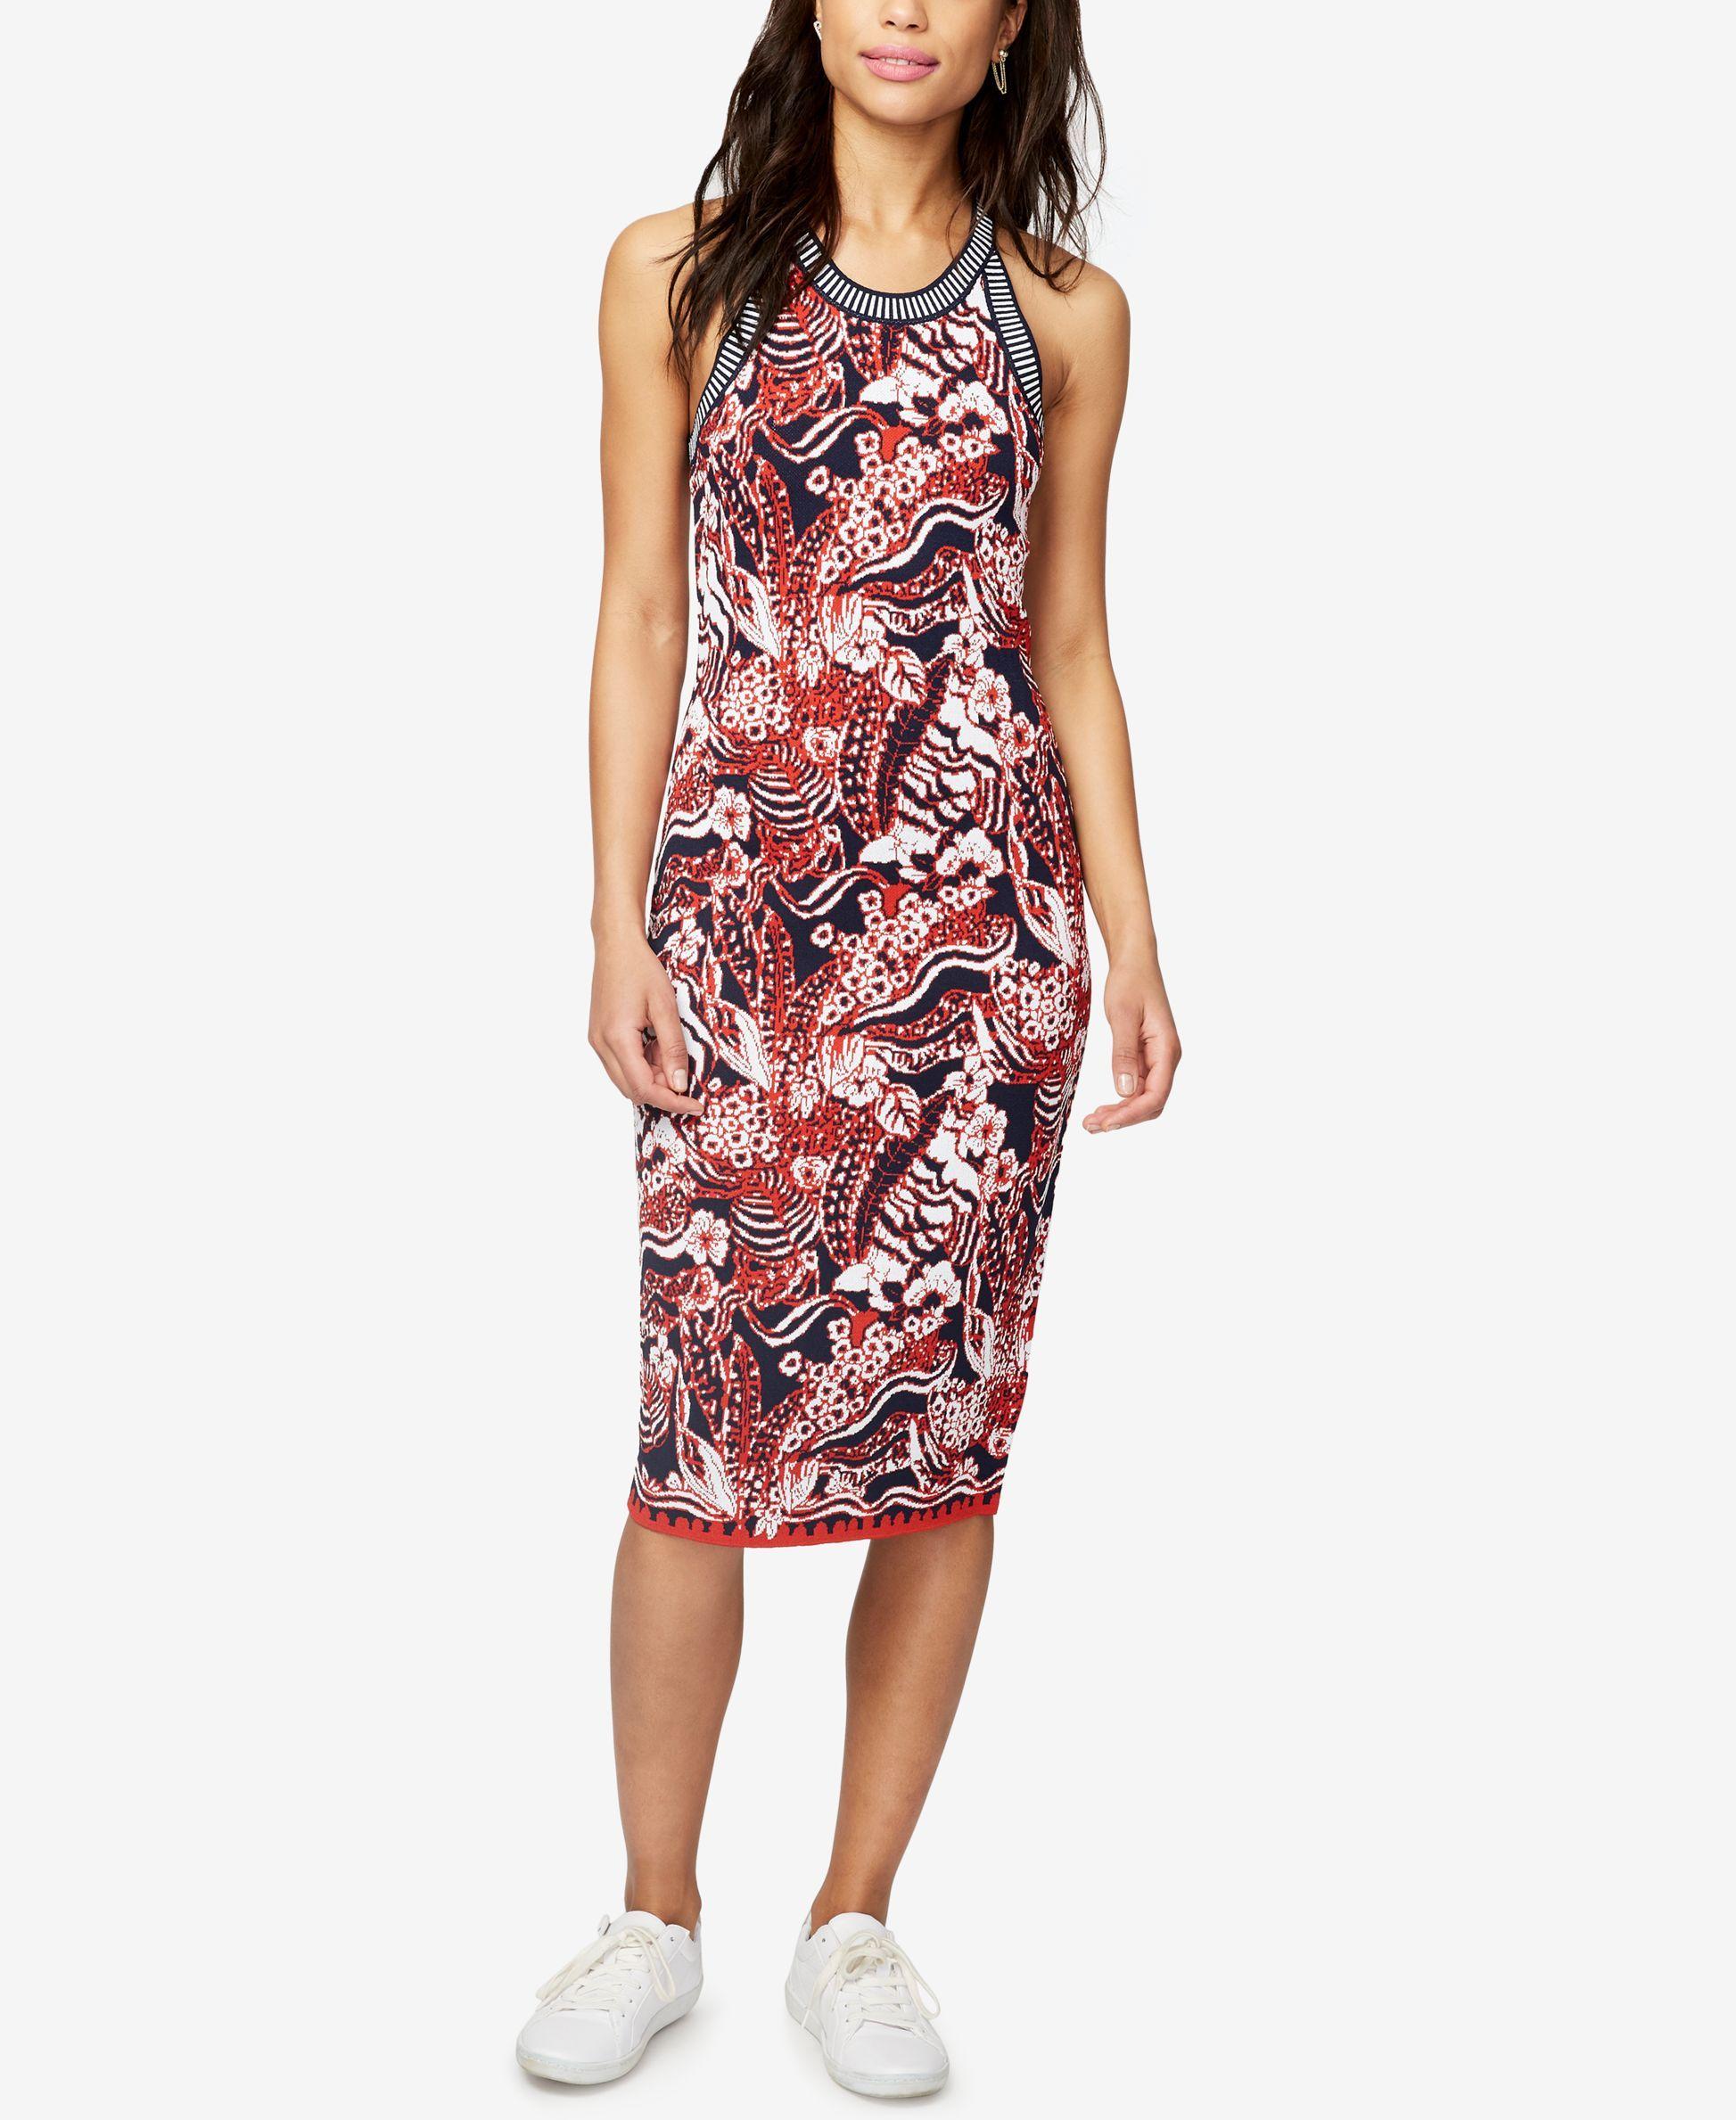 Rachel Rachel Roy Jacquard Bodycon Dress, Only at Macy's